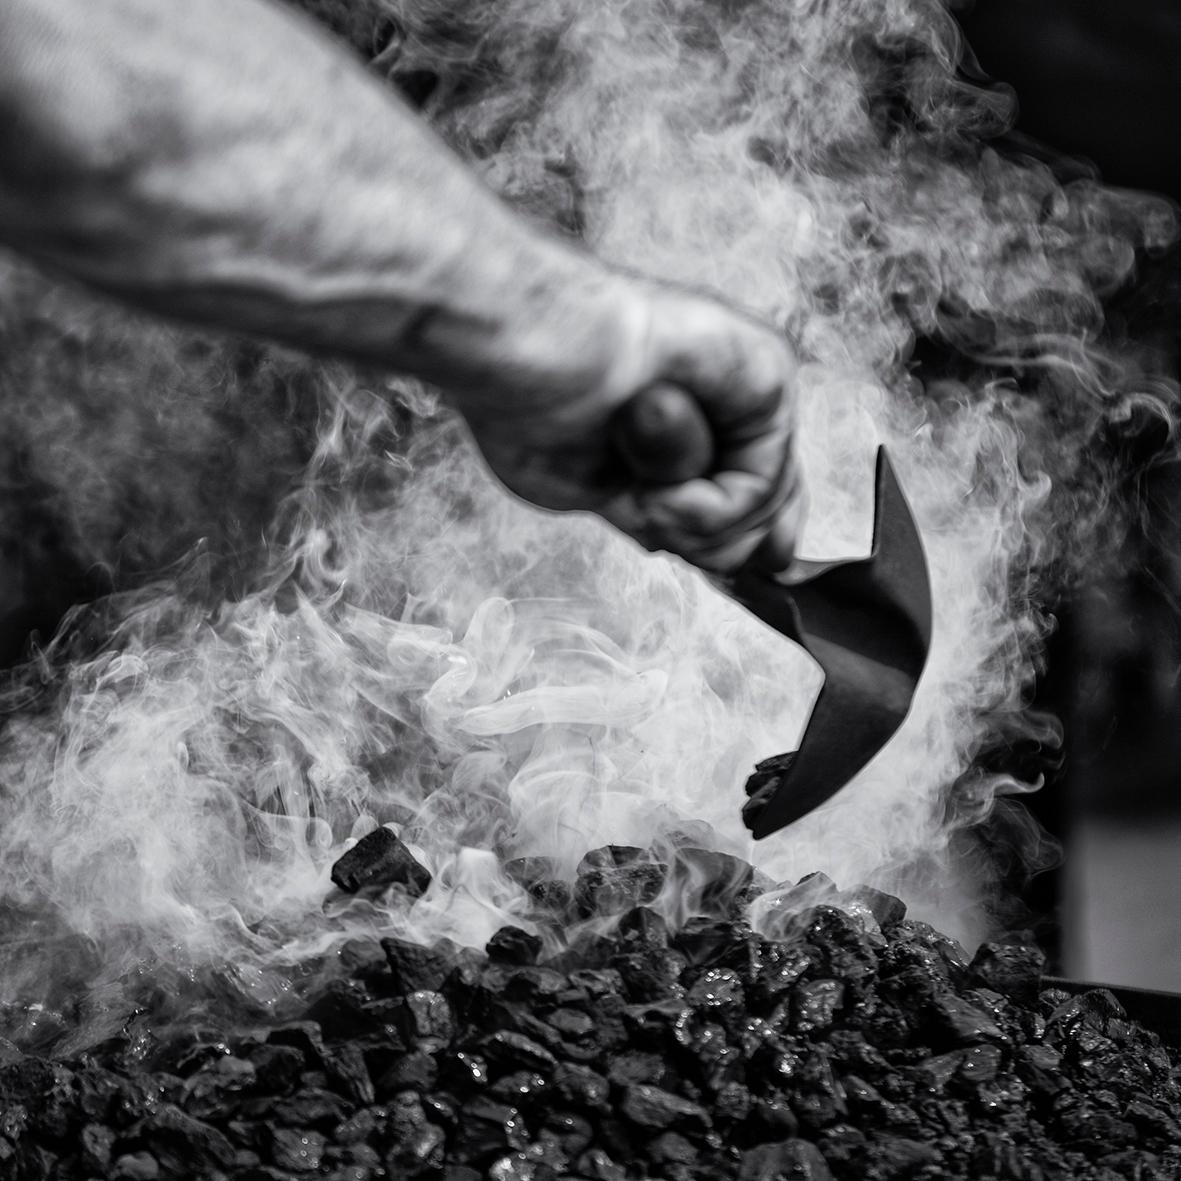 Blacksmith. Fire. Steam. Hammer - mauriliers | ello